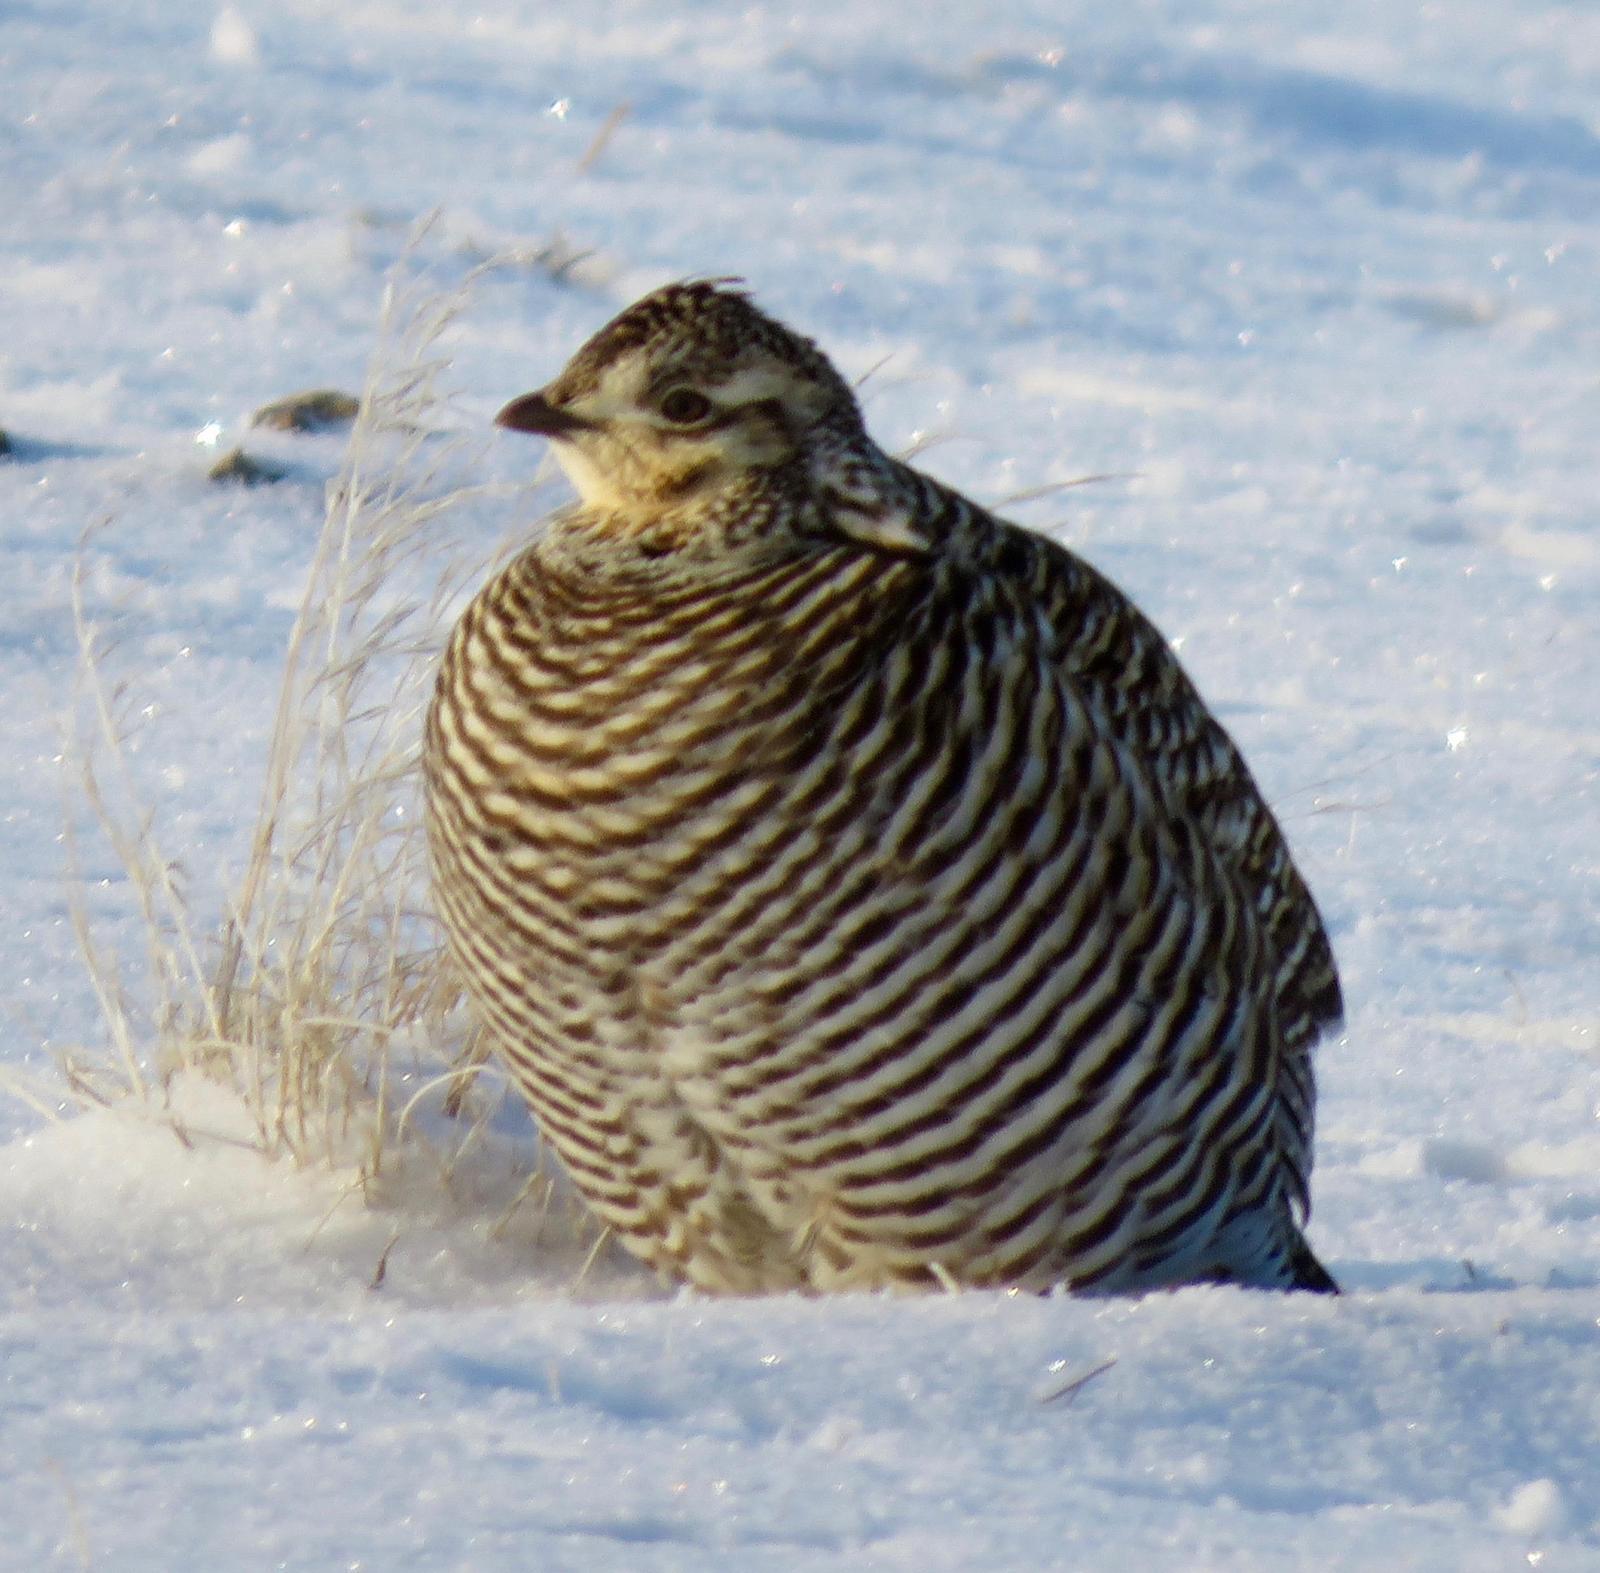 Greater Prairie-Chicken Photo by Don Glasco